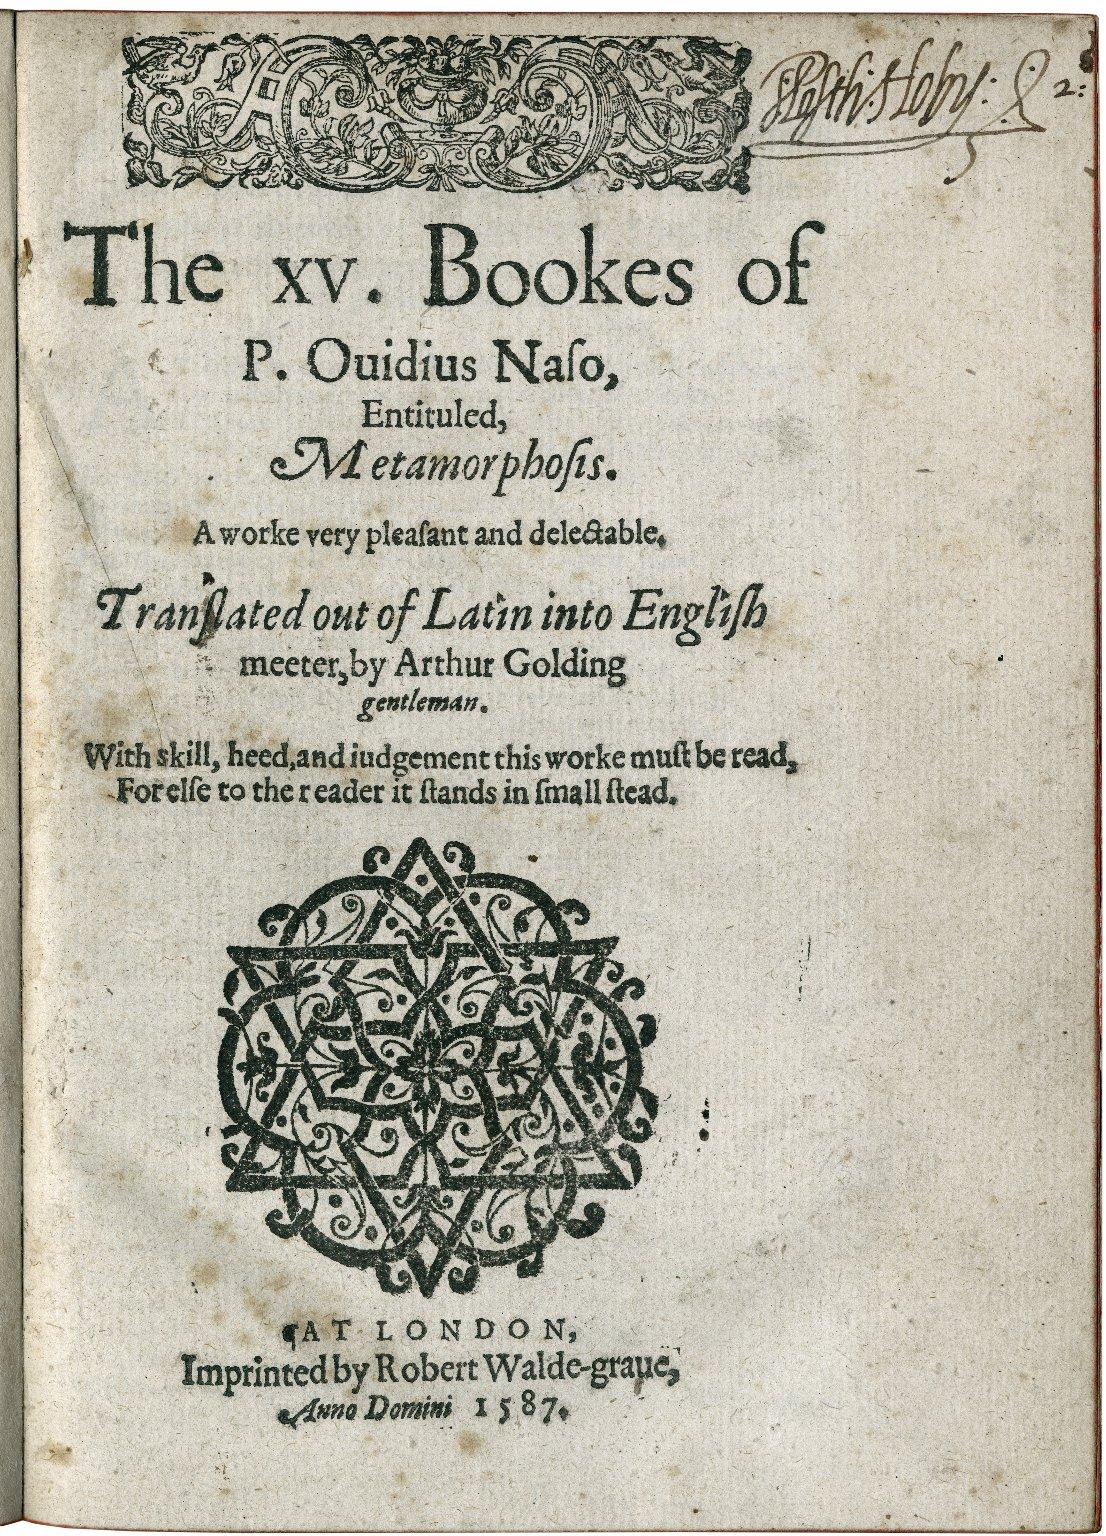 The xv. bookes of P. Ouidius Naso, entituled, Metamorphosis.